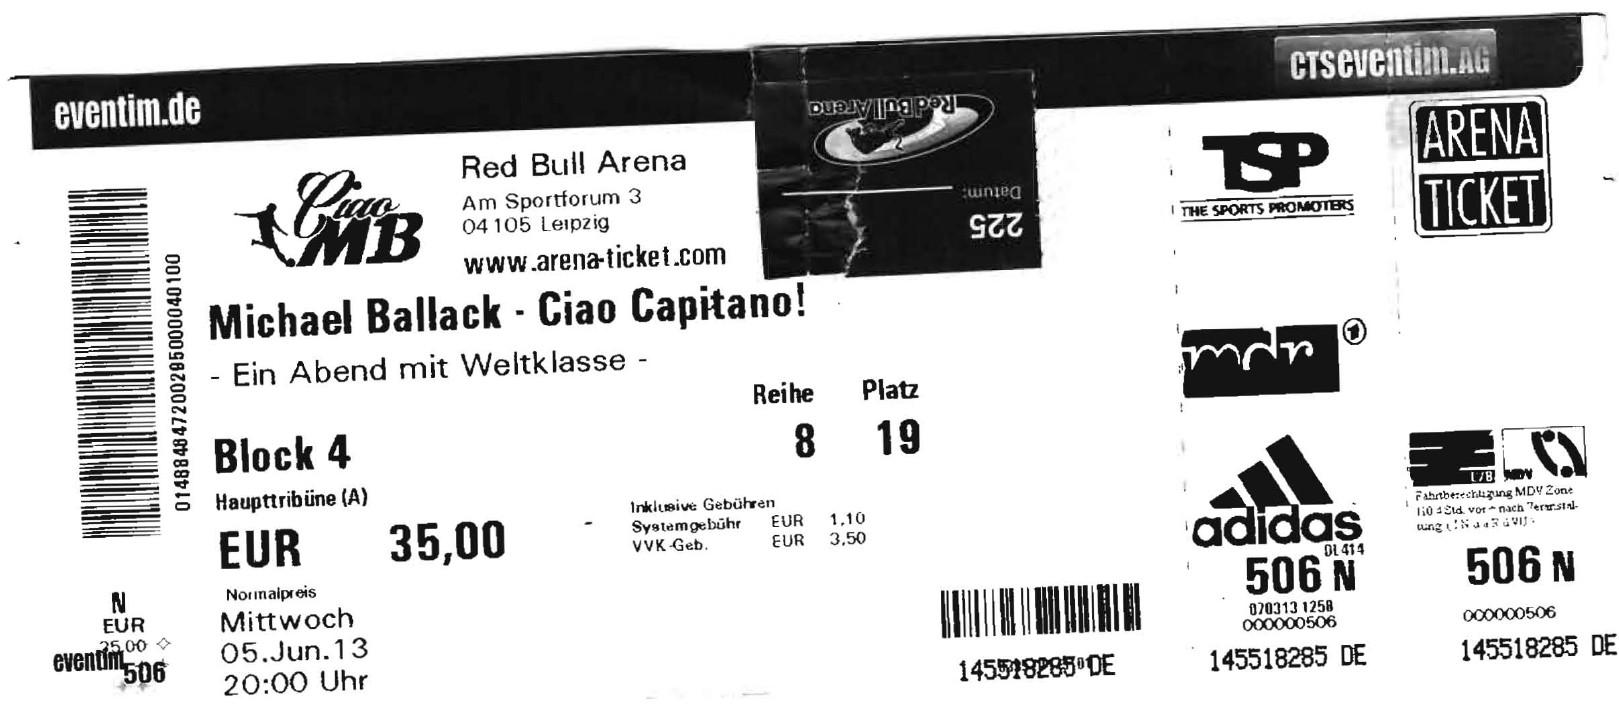 Michael Ballack - Cia Capitano - Red Bull Arena Leipzig